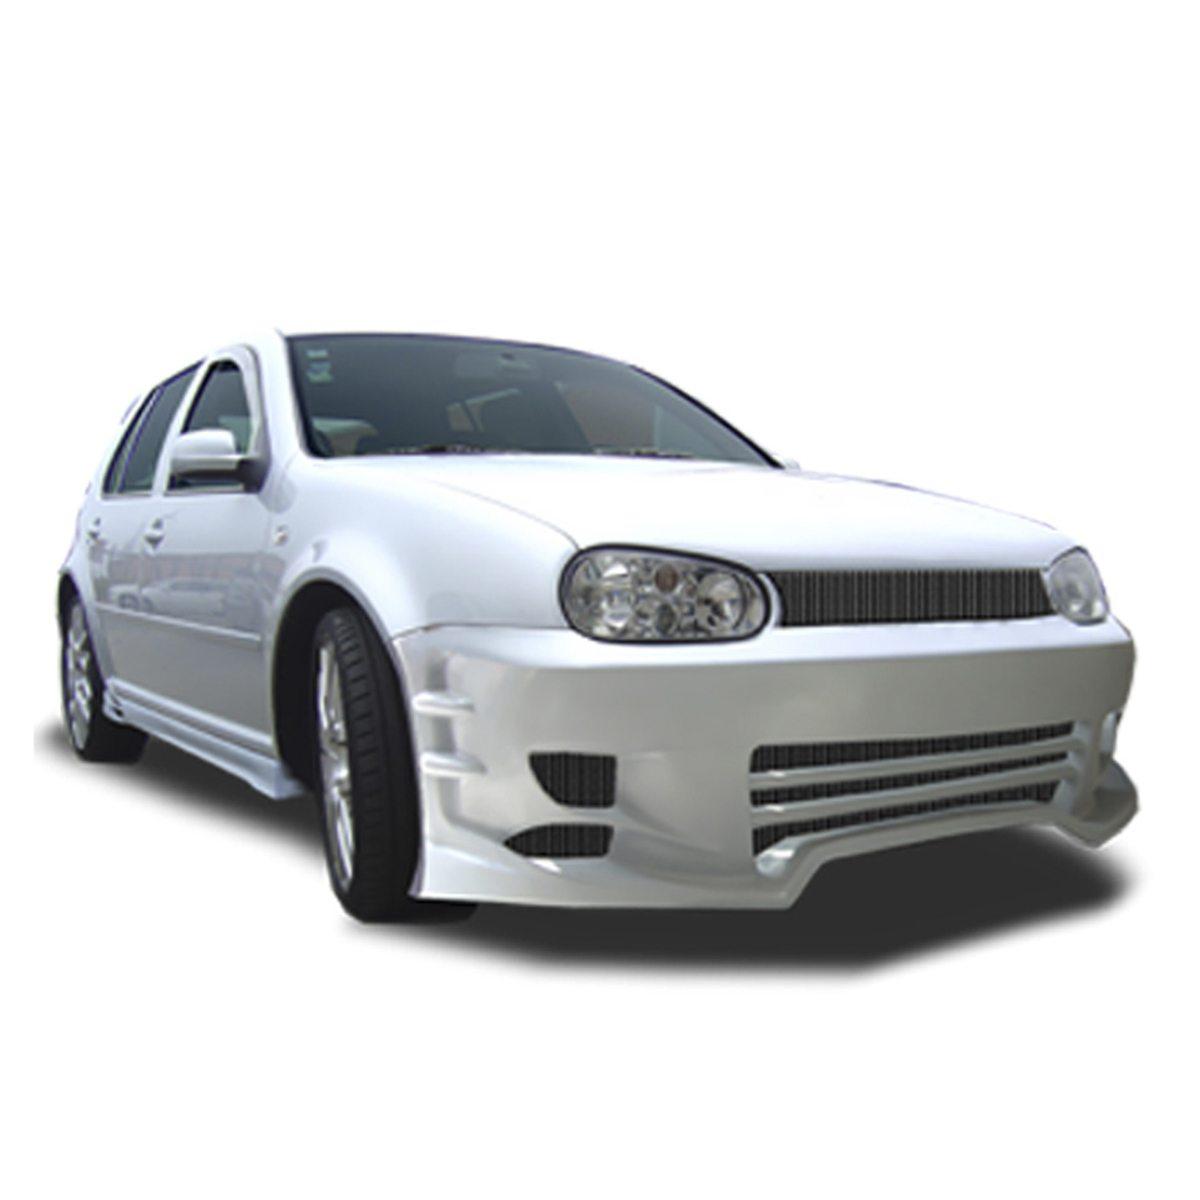 VW-Golf-IV-Swat-Frt-PCU1090